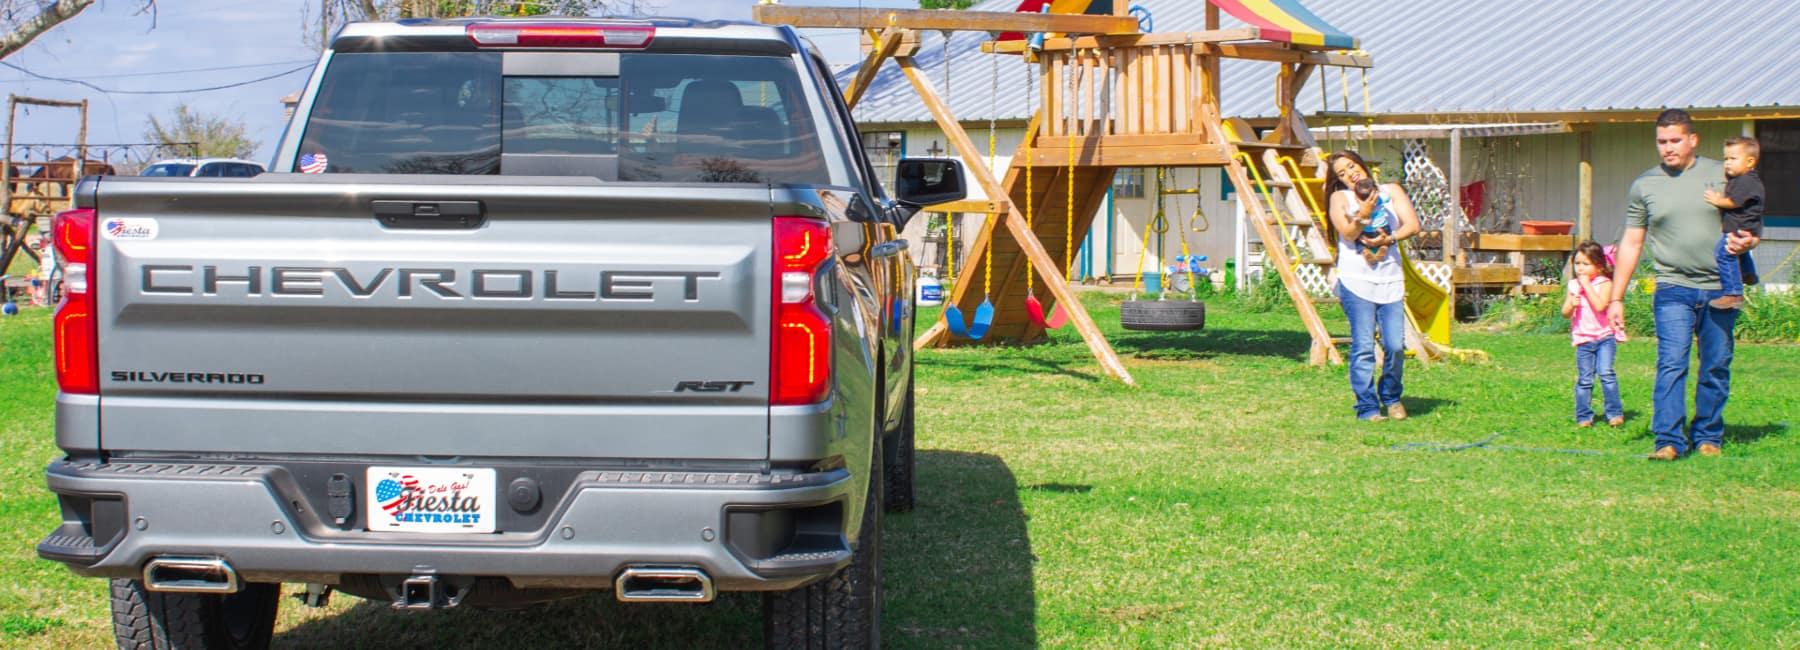 2021 Chevy Silverado 1500 and Family   Mission, TX